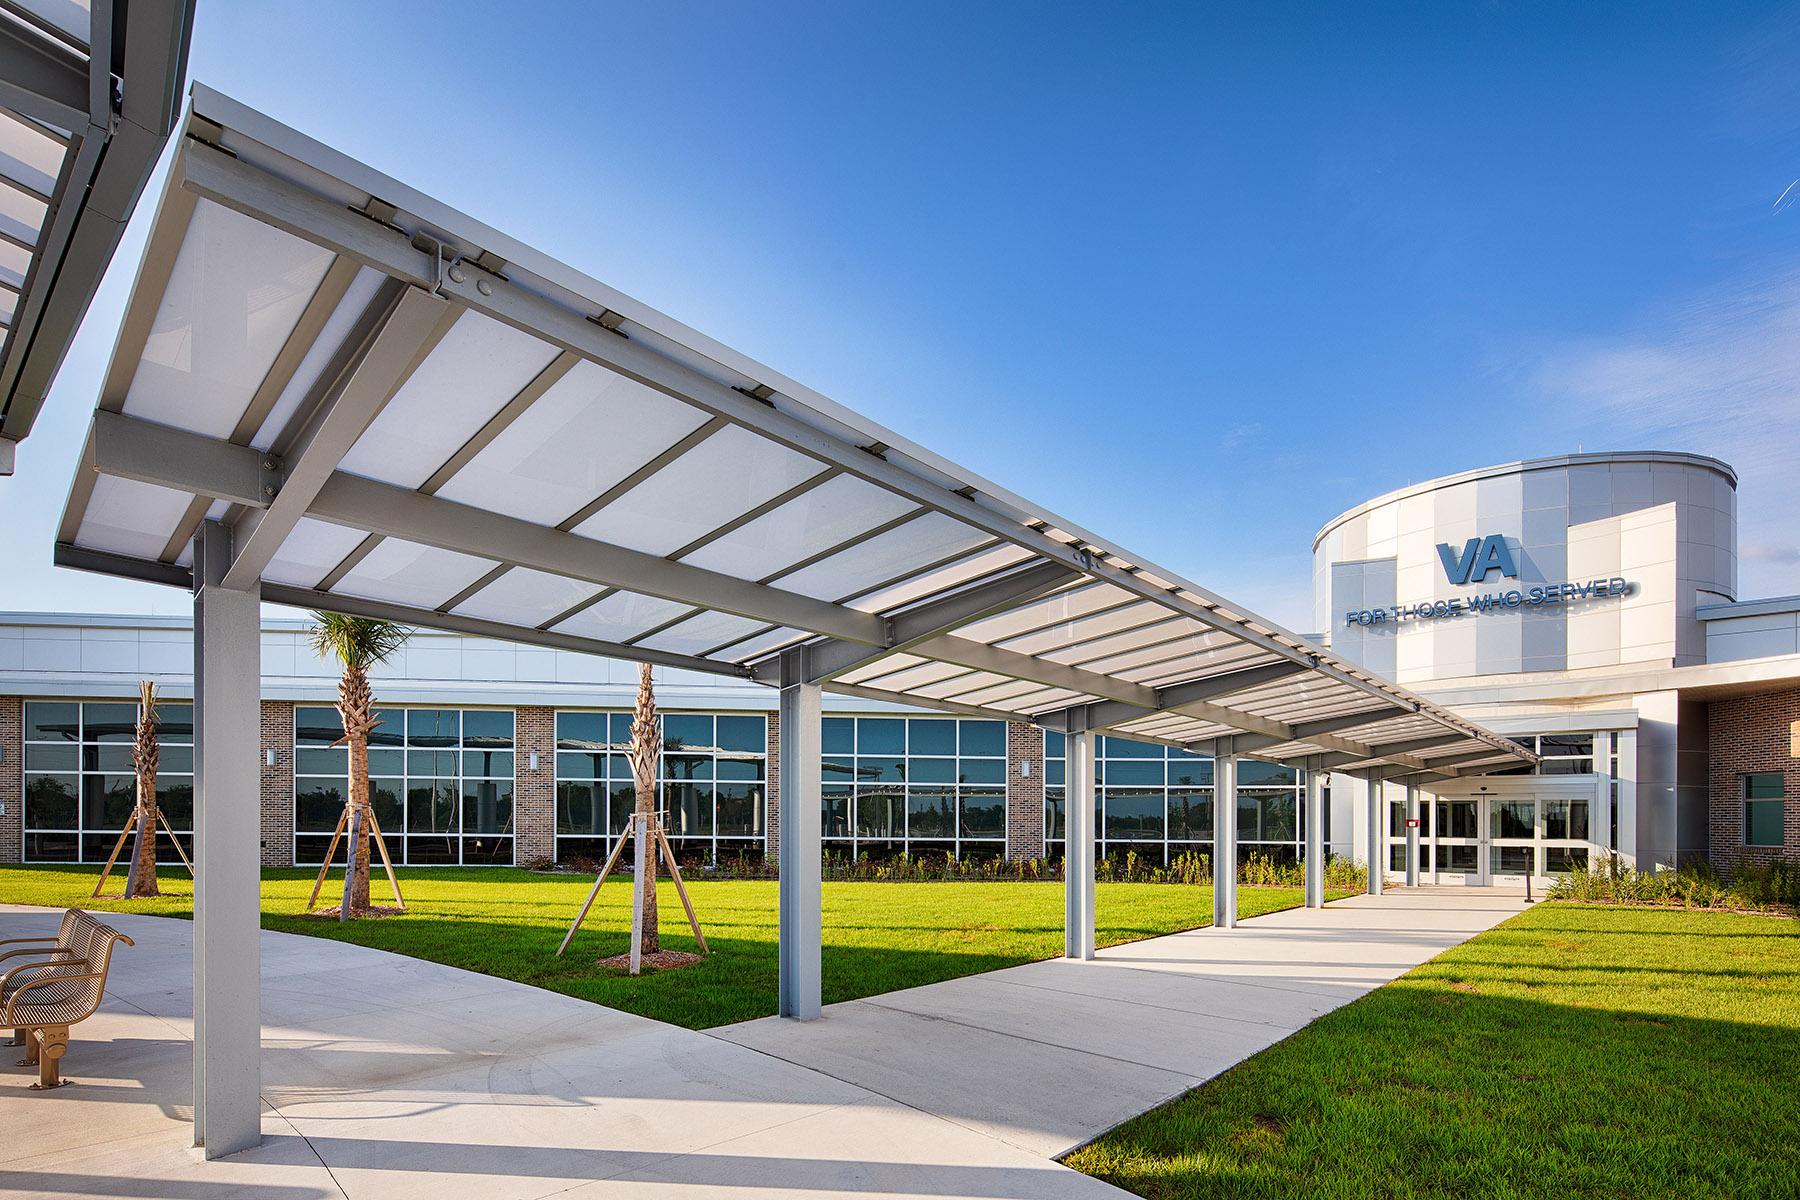 Encompass Health Rehabilitation Hospital - Doster Construction